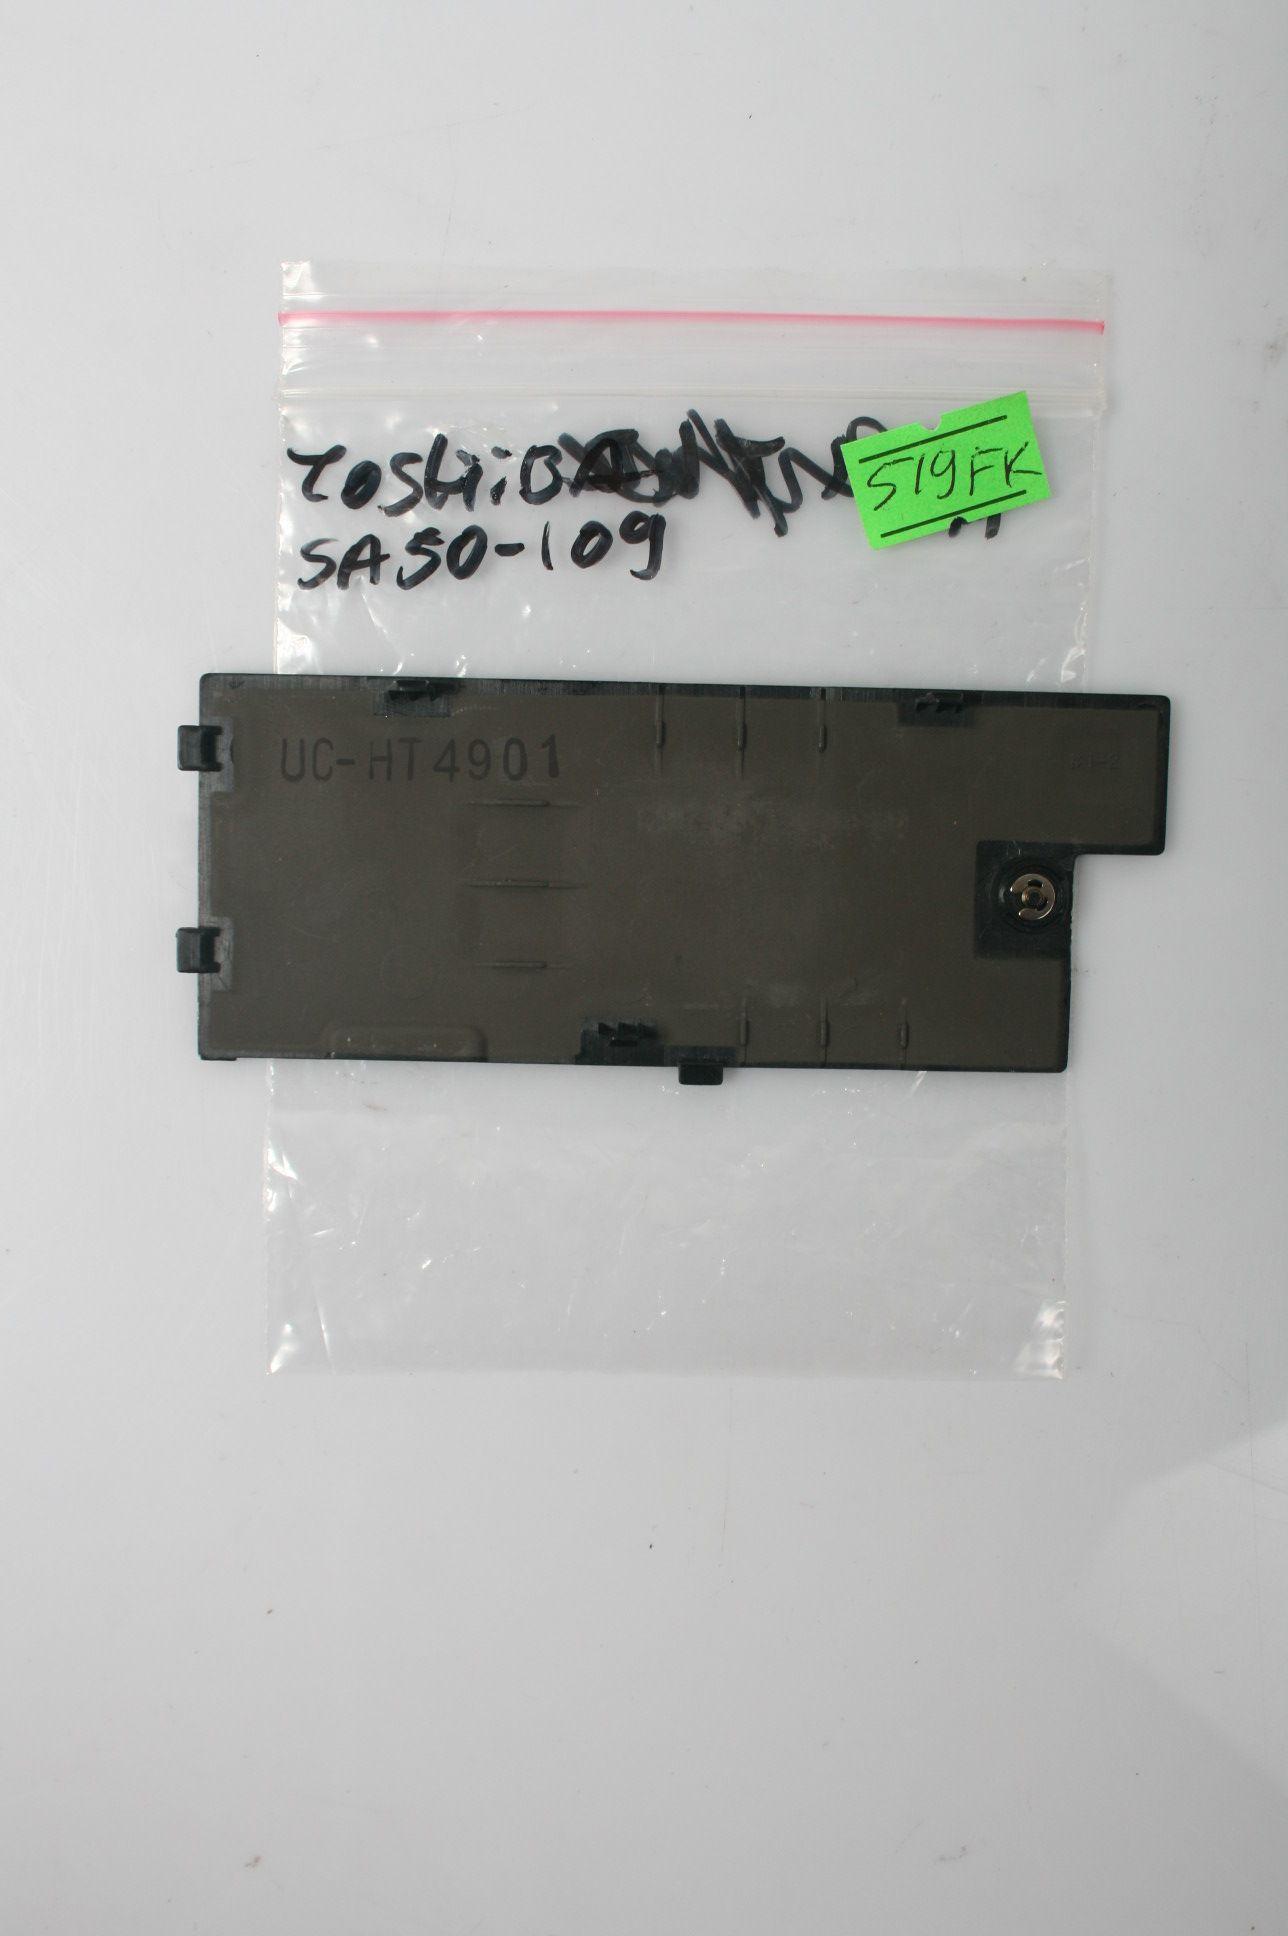 TOSHIBA Satellite SA50-109 Ram Cover UC-HT4901